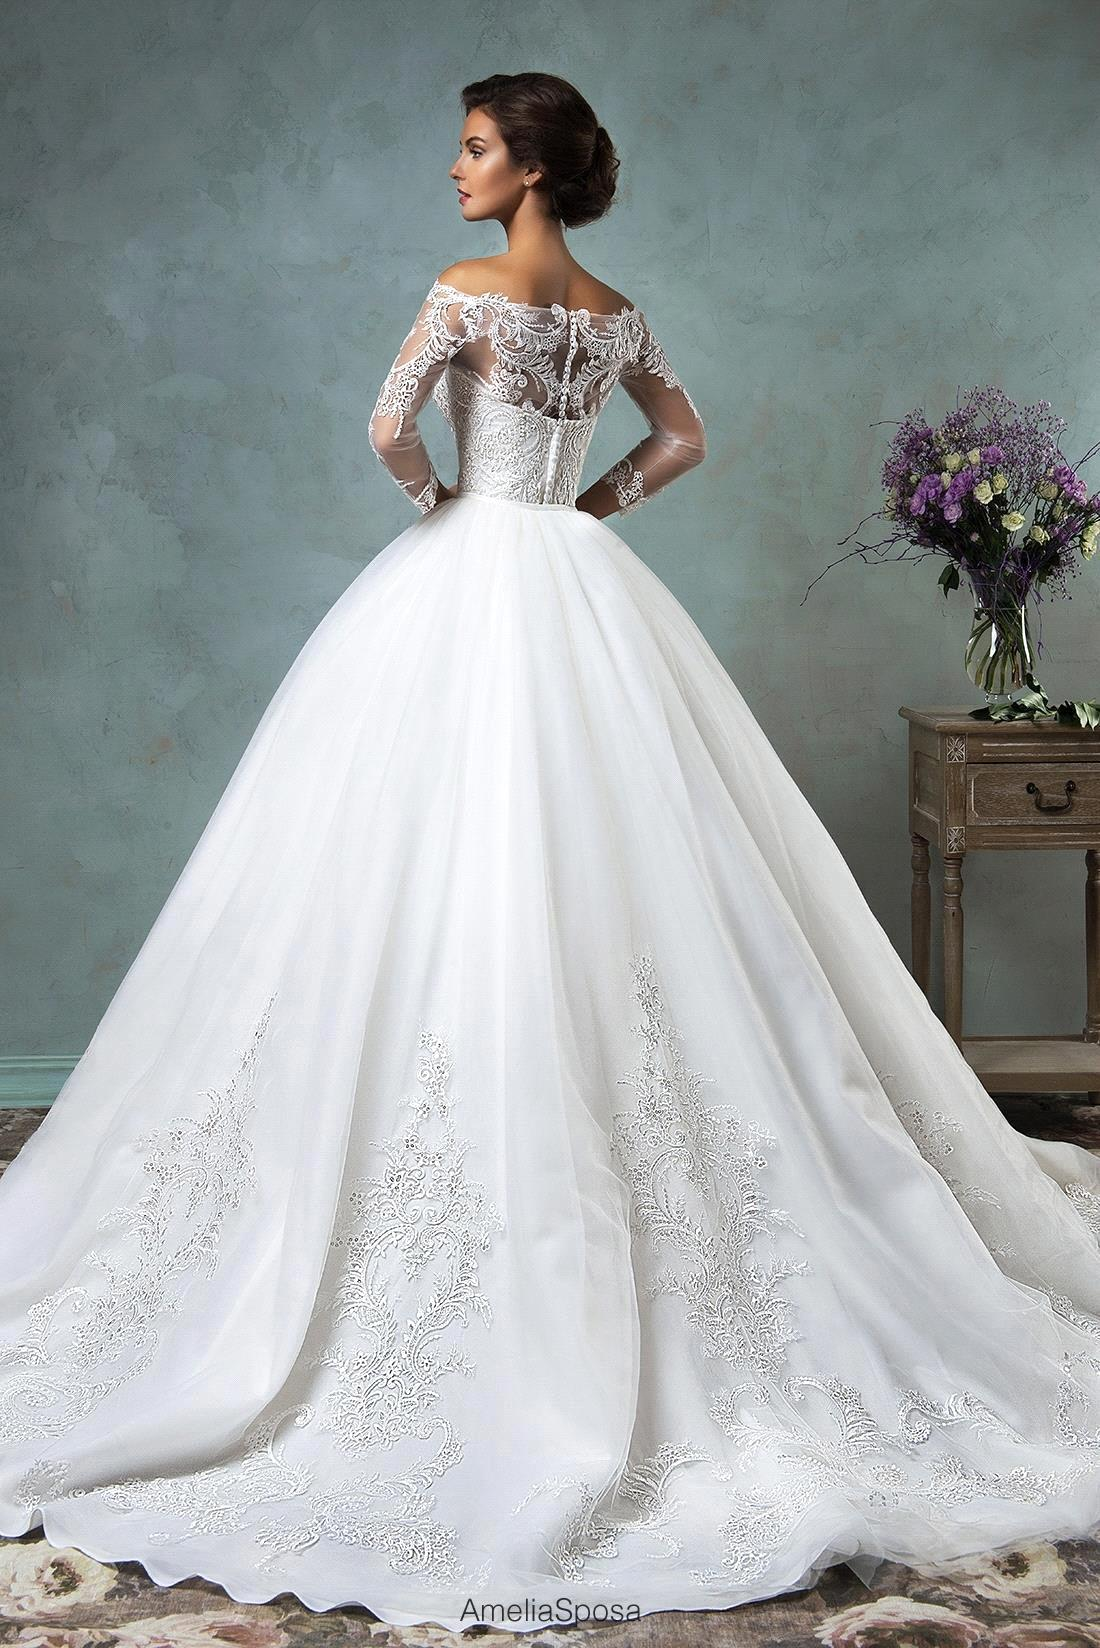 Aliexpress.com : Buy 2017 Elegant Wedding Dress With Sleeves Off ...